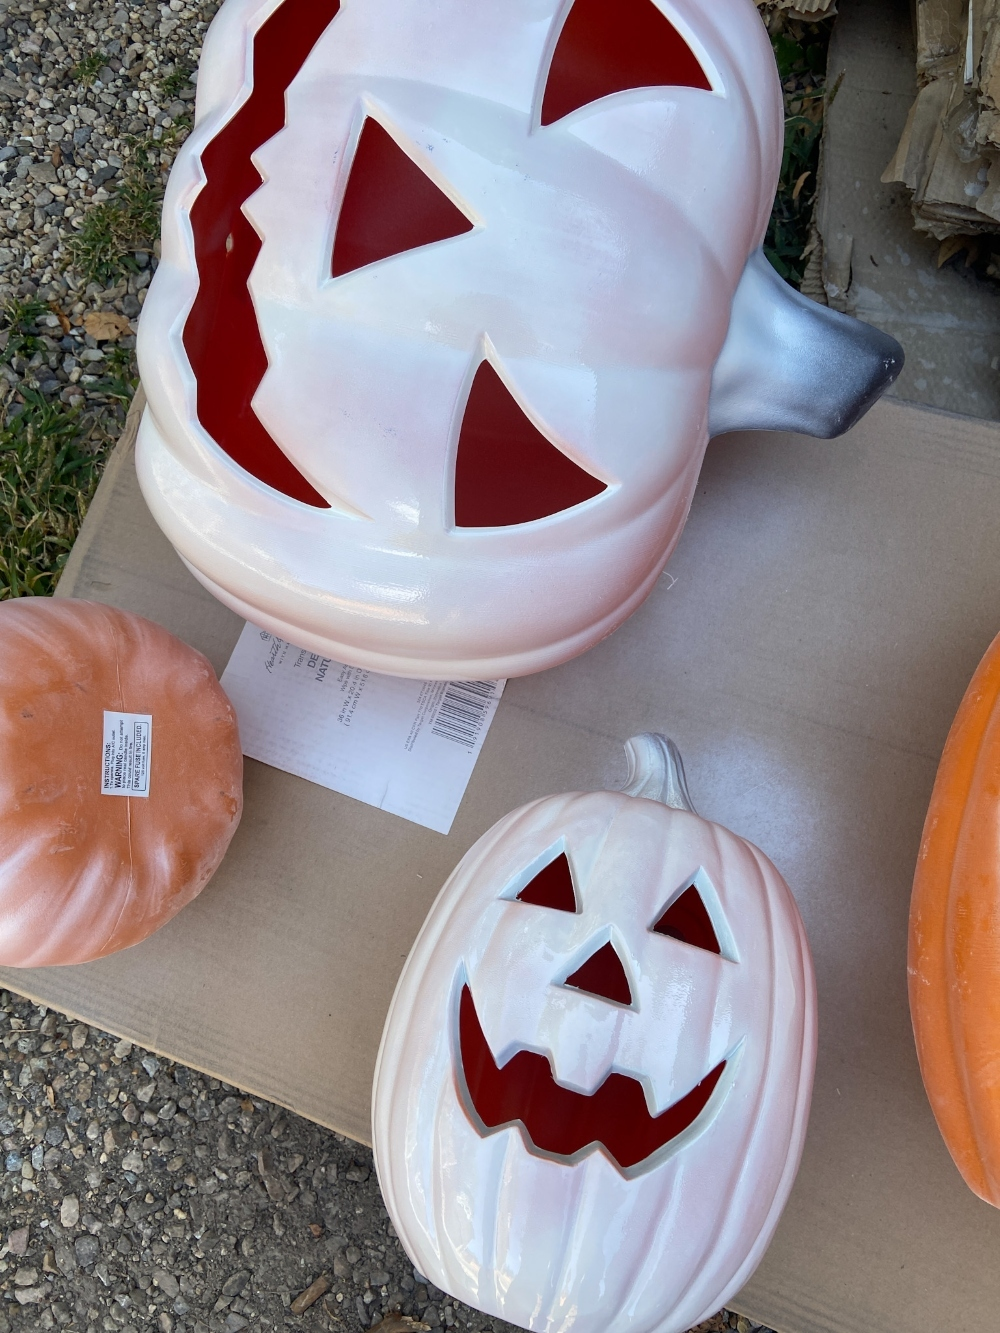 The Great Pumpkin Halloween Porch! Spray paint inexpensive jack-o-lanterns, pumpkin pails and make a jack-o-lantern topiary for a festive pumpkin porch!